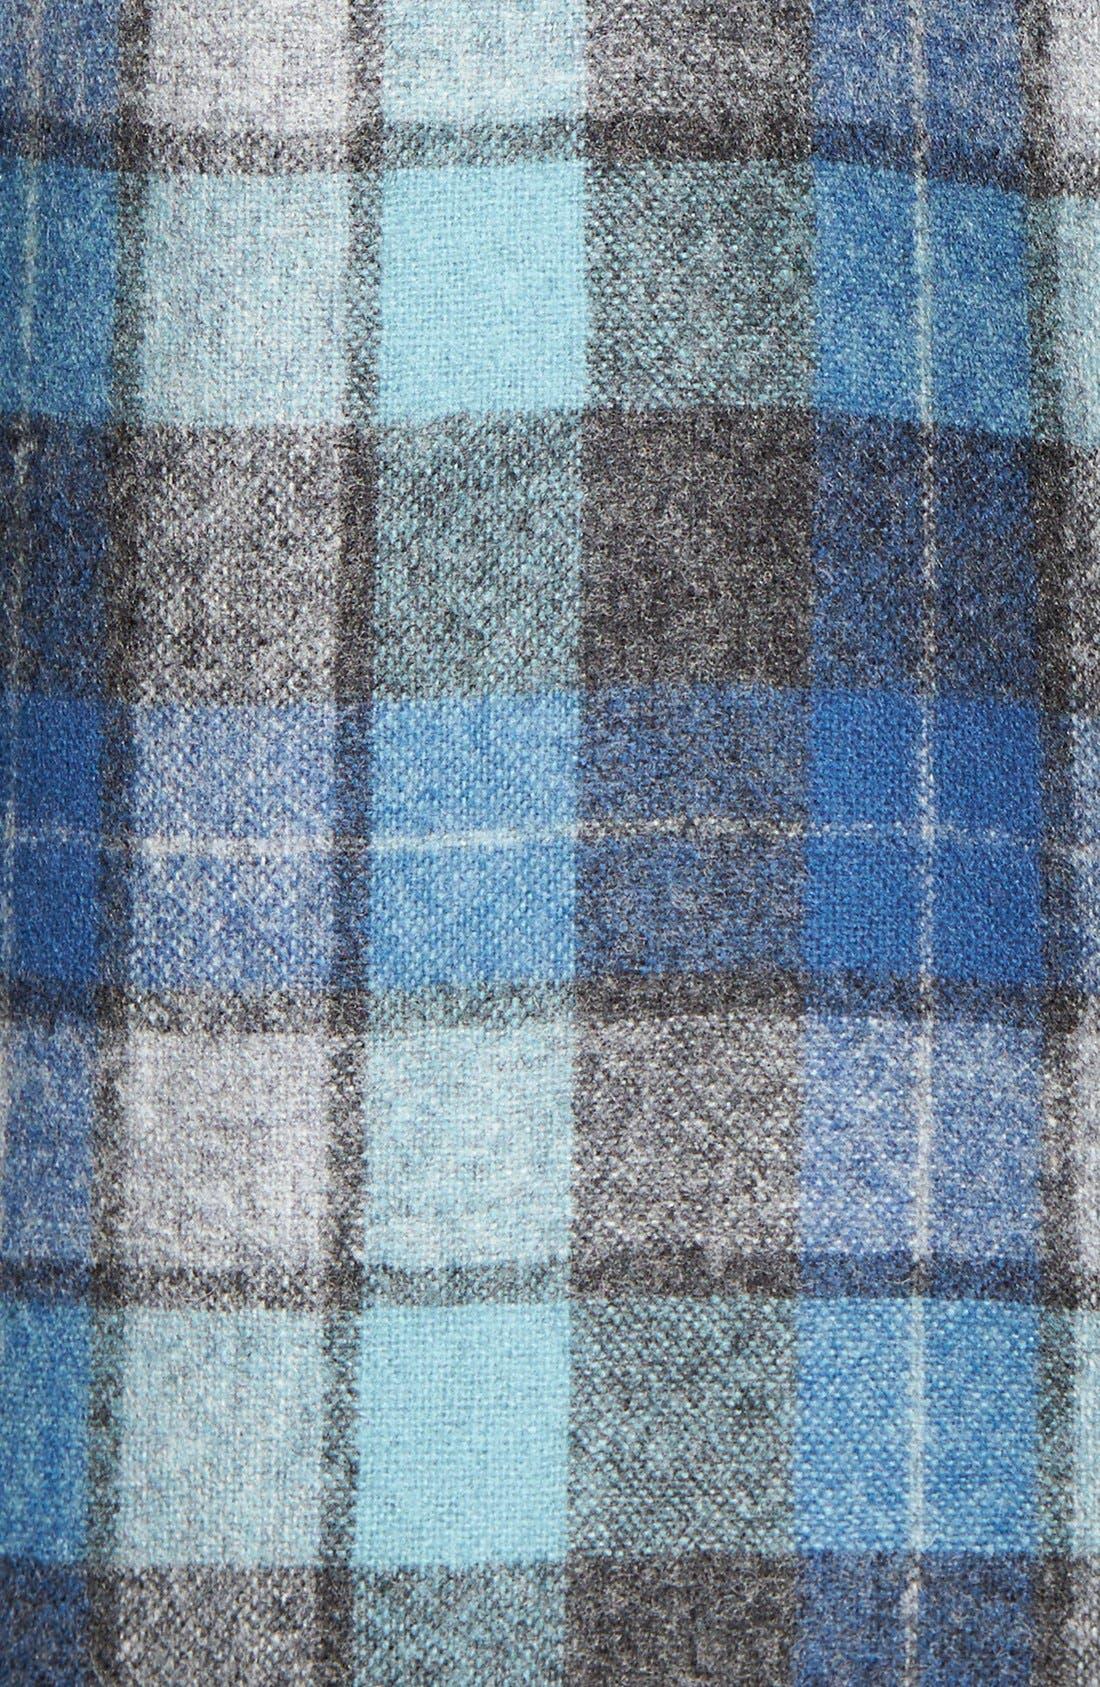 'Board' Regular Fit Flannel Shirt,                             Alternate thumbnail 5, color,                             Blue Original Surf Plaid